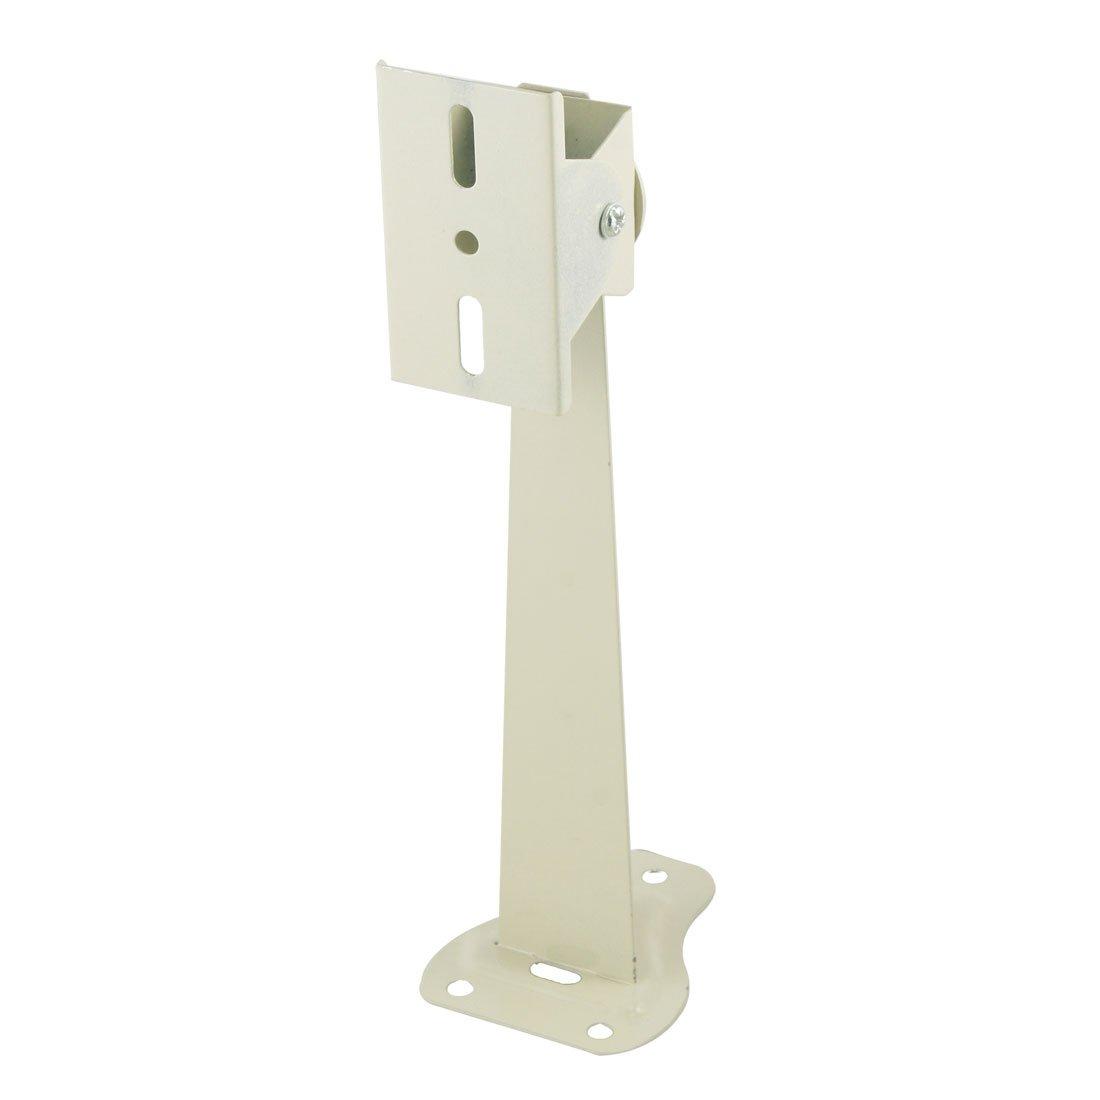 Soporte de pared Metal soporte Funció n atril para cá mara de CCTV IP CCD 24.5 cm Altura Sourcingmap a12062100ux0123